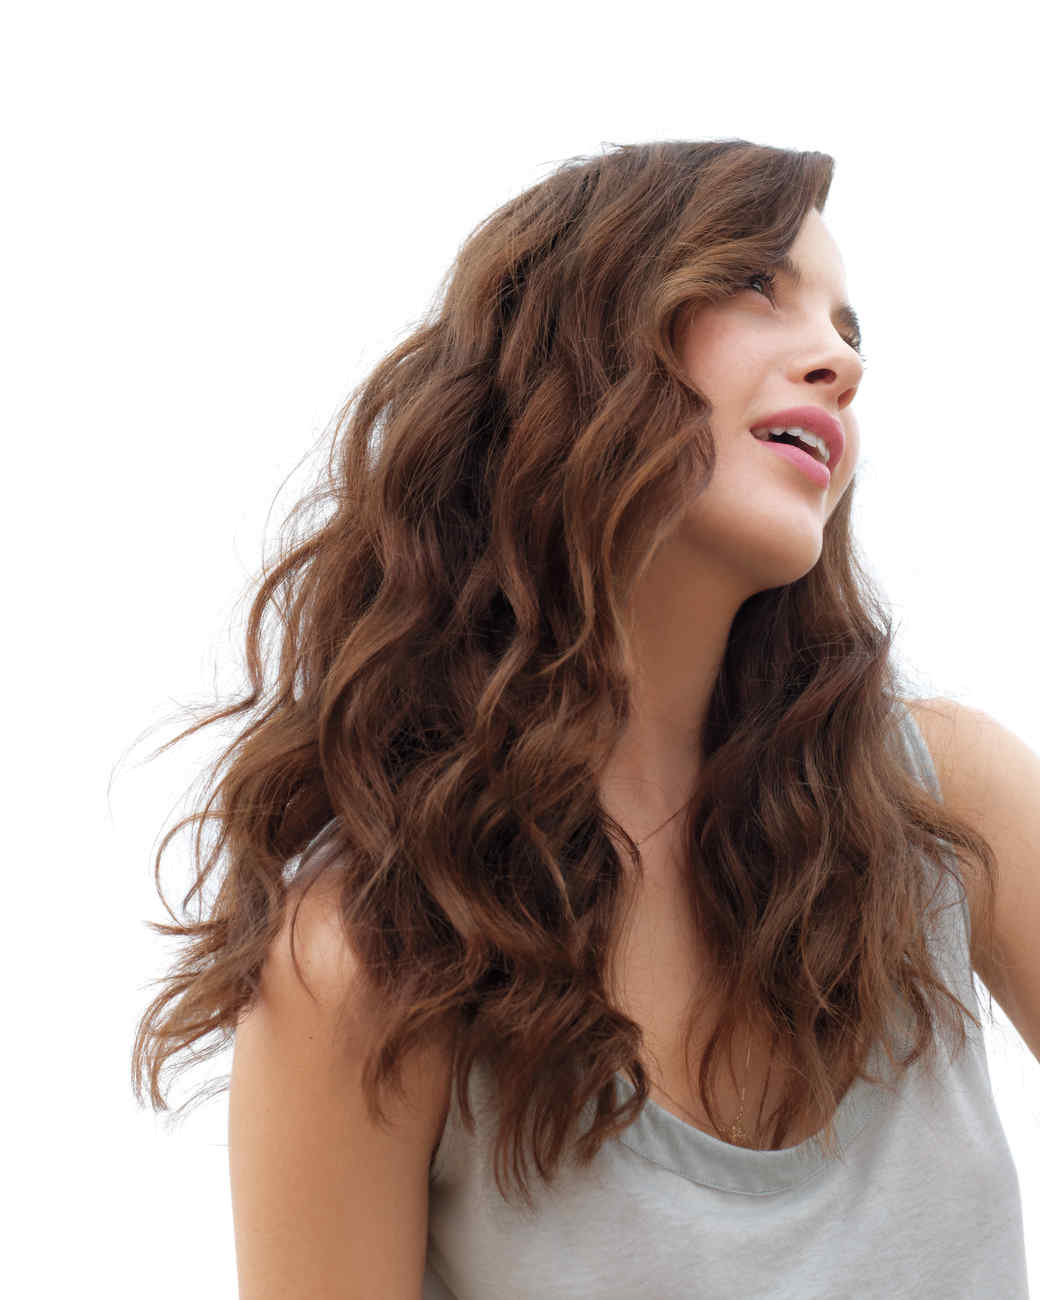 model-curls-mbd108578.jpg